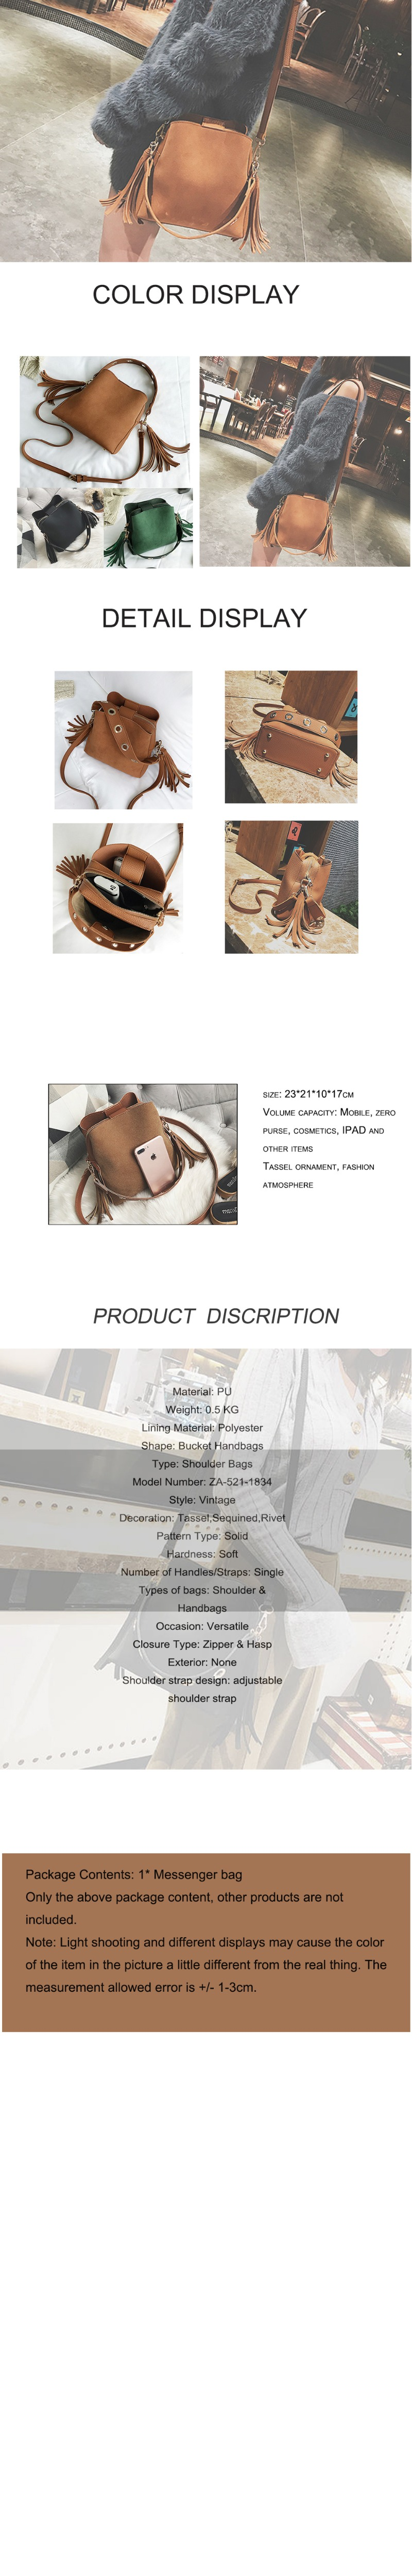 2018 Fashion Scrub Women Bucket Bag Vintage Tassel Messenger Bag High Quality Retro Shoulder Bag Simple Crossbody Bag Tote 14